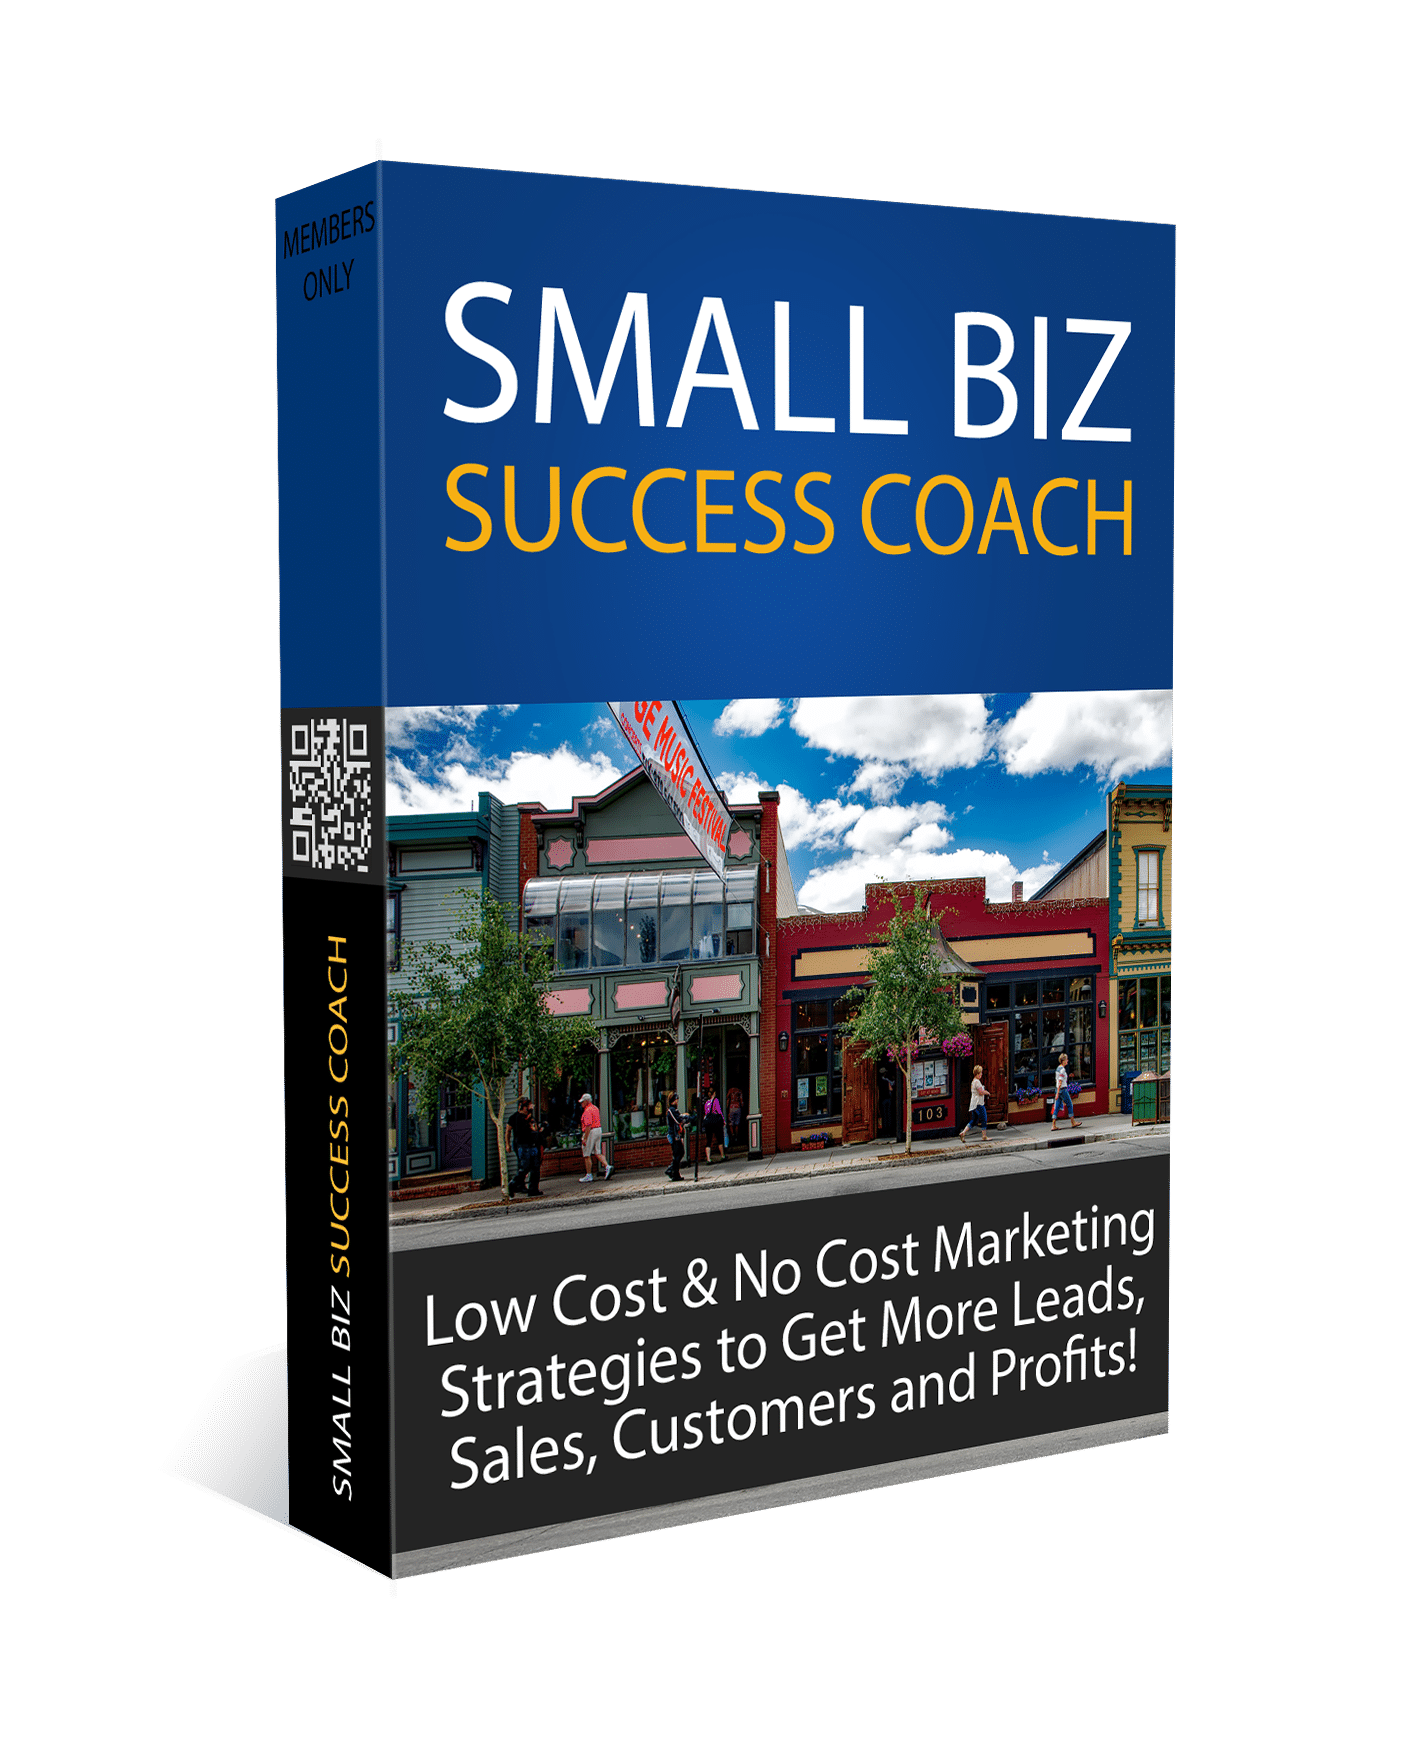 Small Biz Success Coach Program